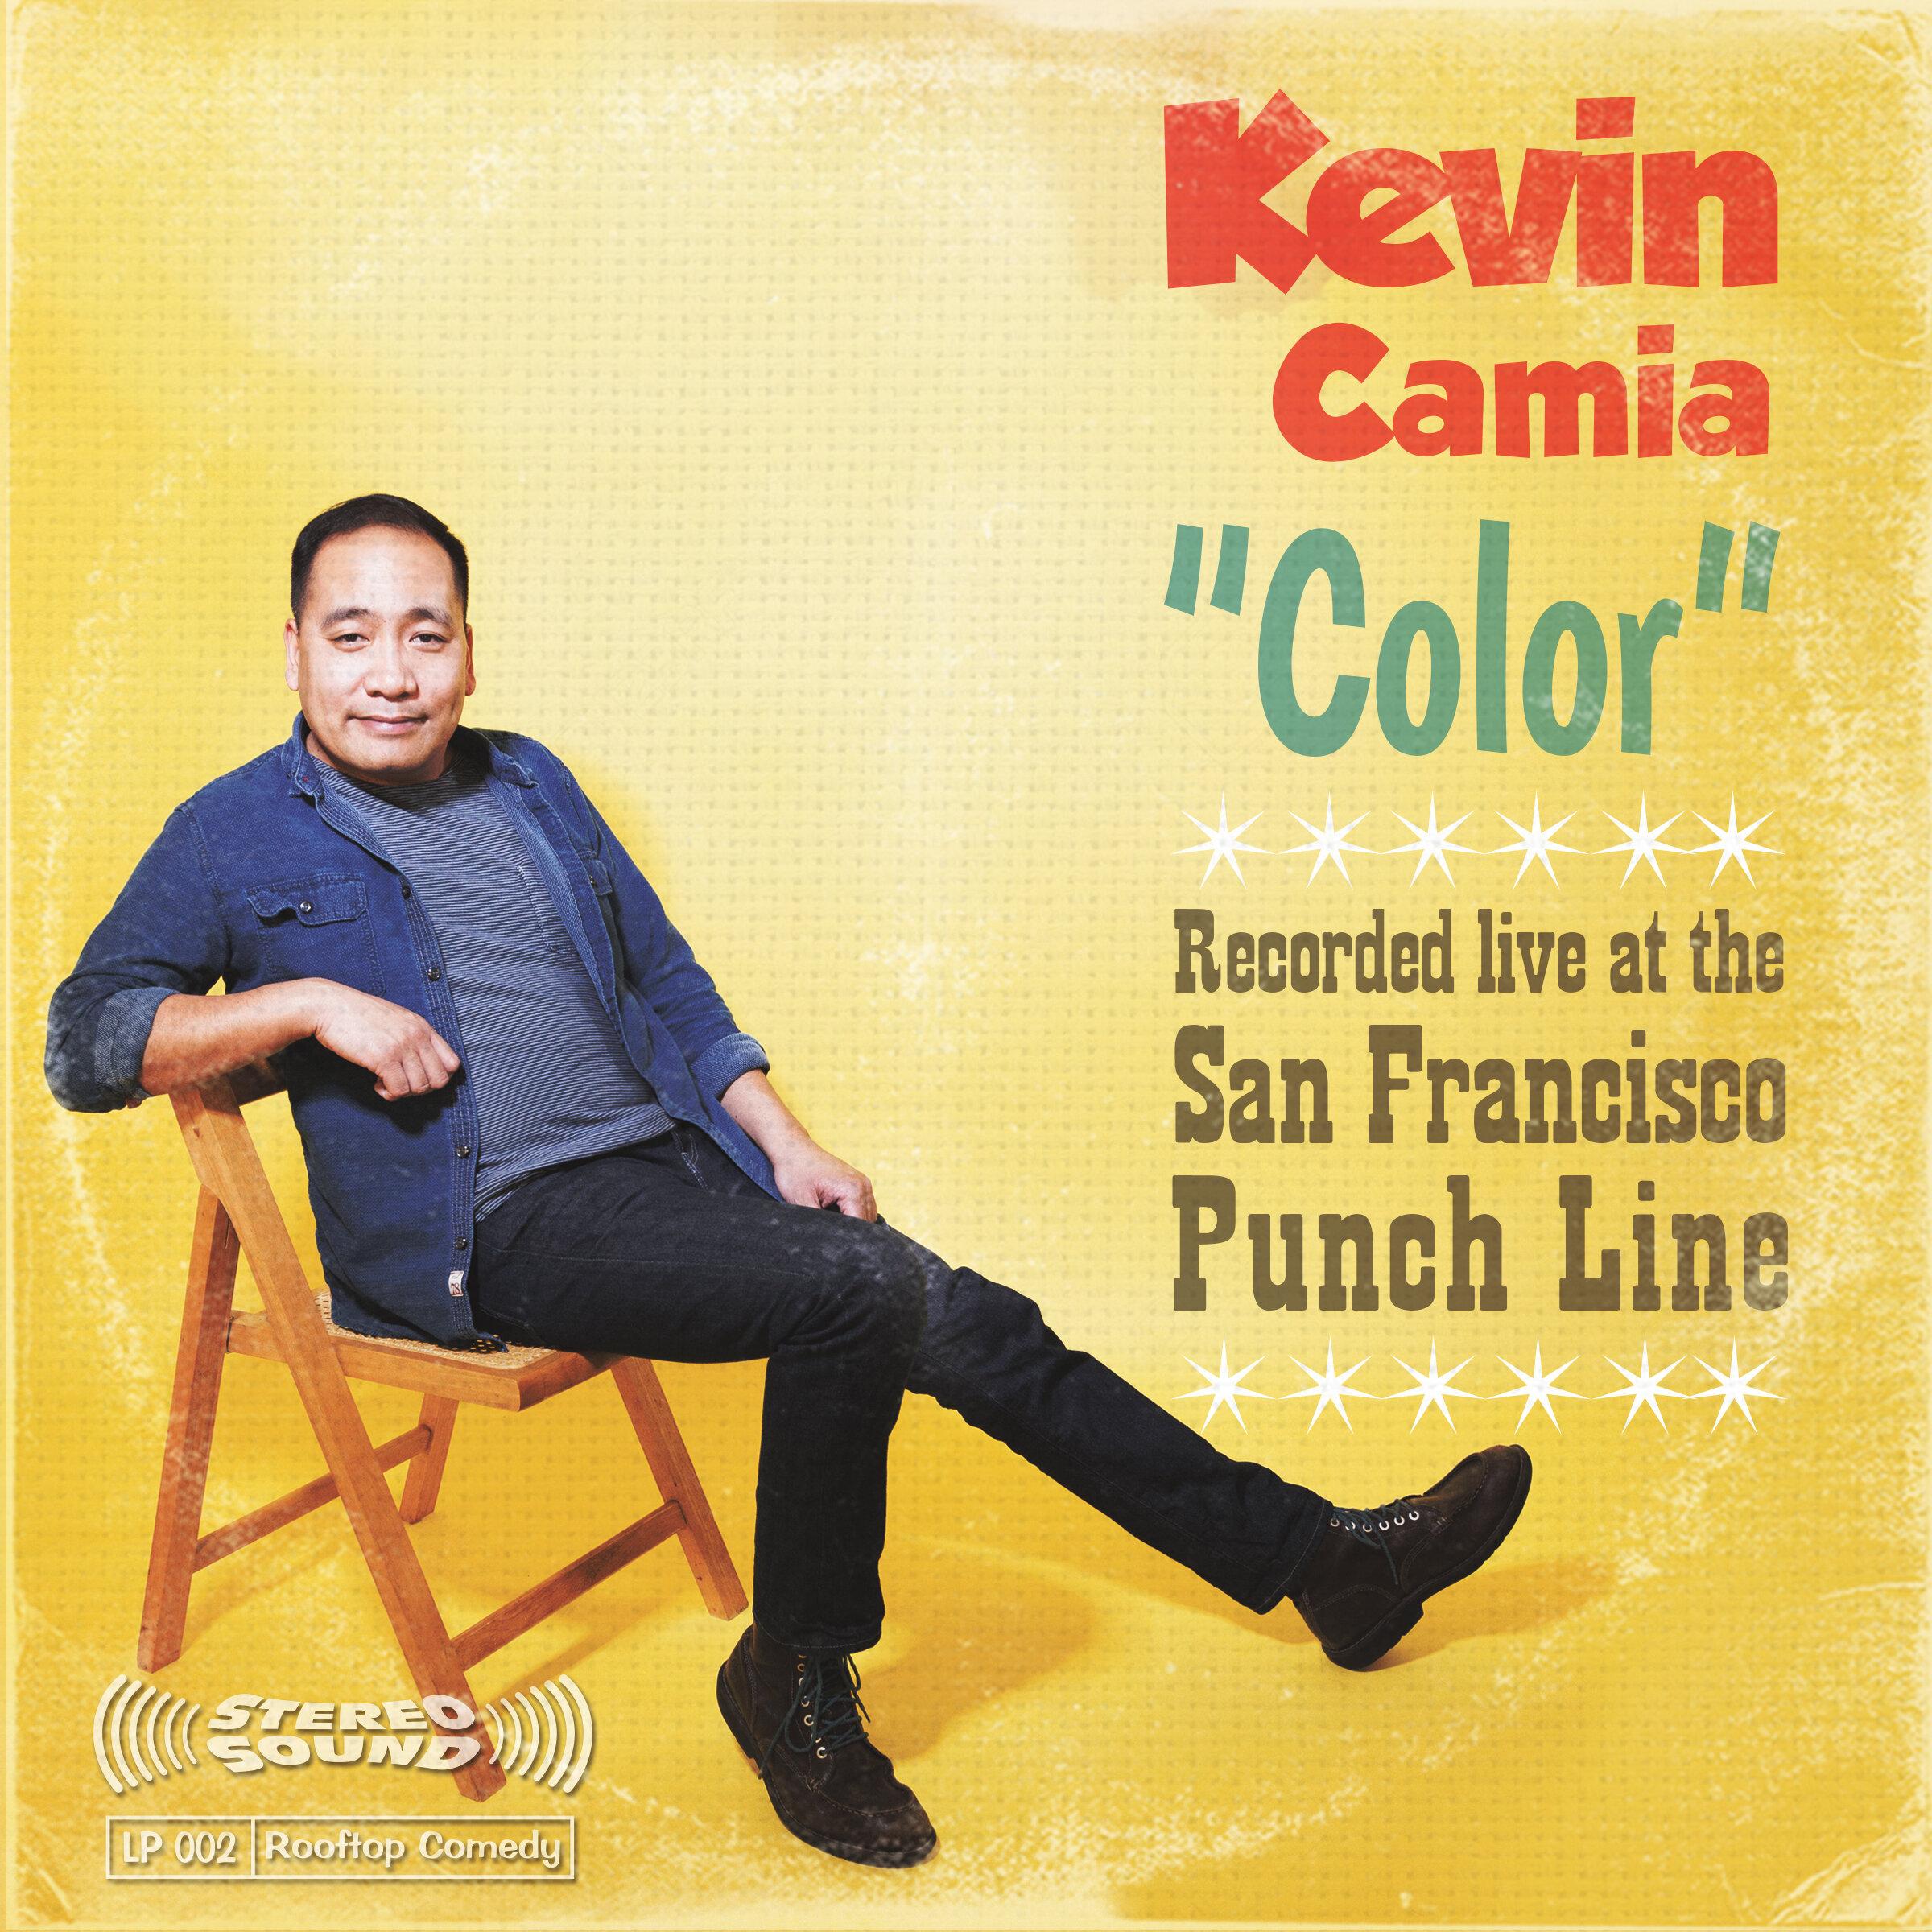 Kevin-cover-2400x2400_2016-02-11_v3.jpg